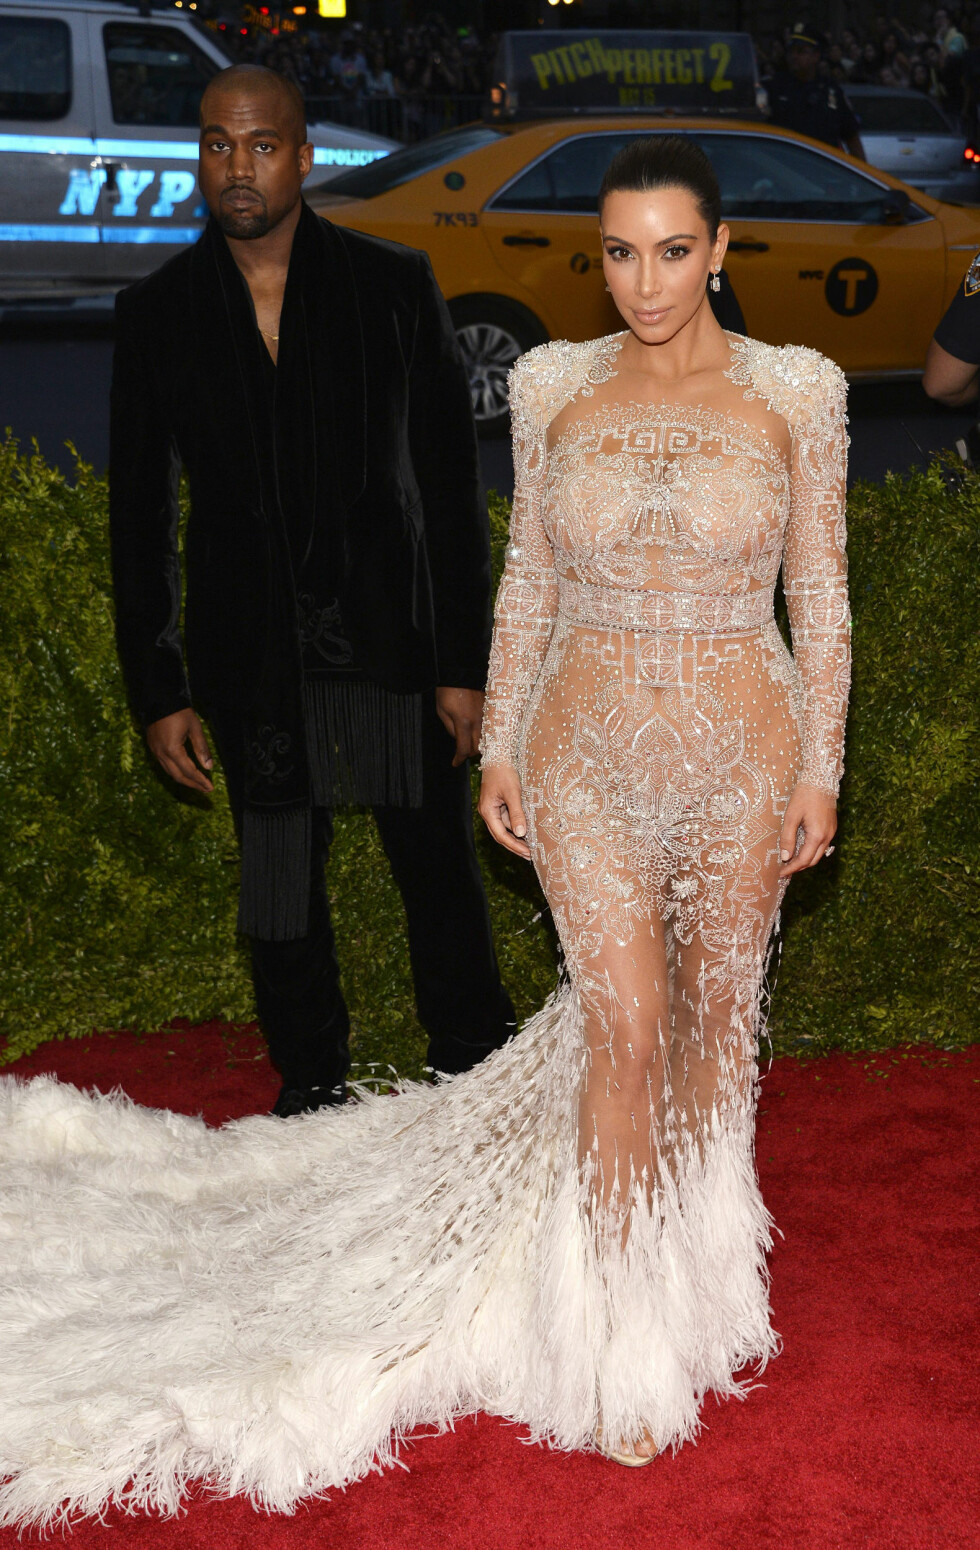 DETALJERT: Kim Kardashian og Kanye West under The Met Gala i 2015. Foto: NTB Scanpix